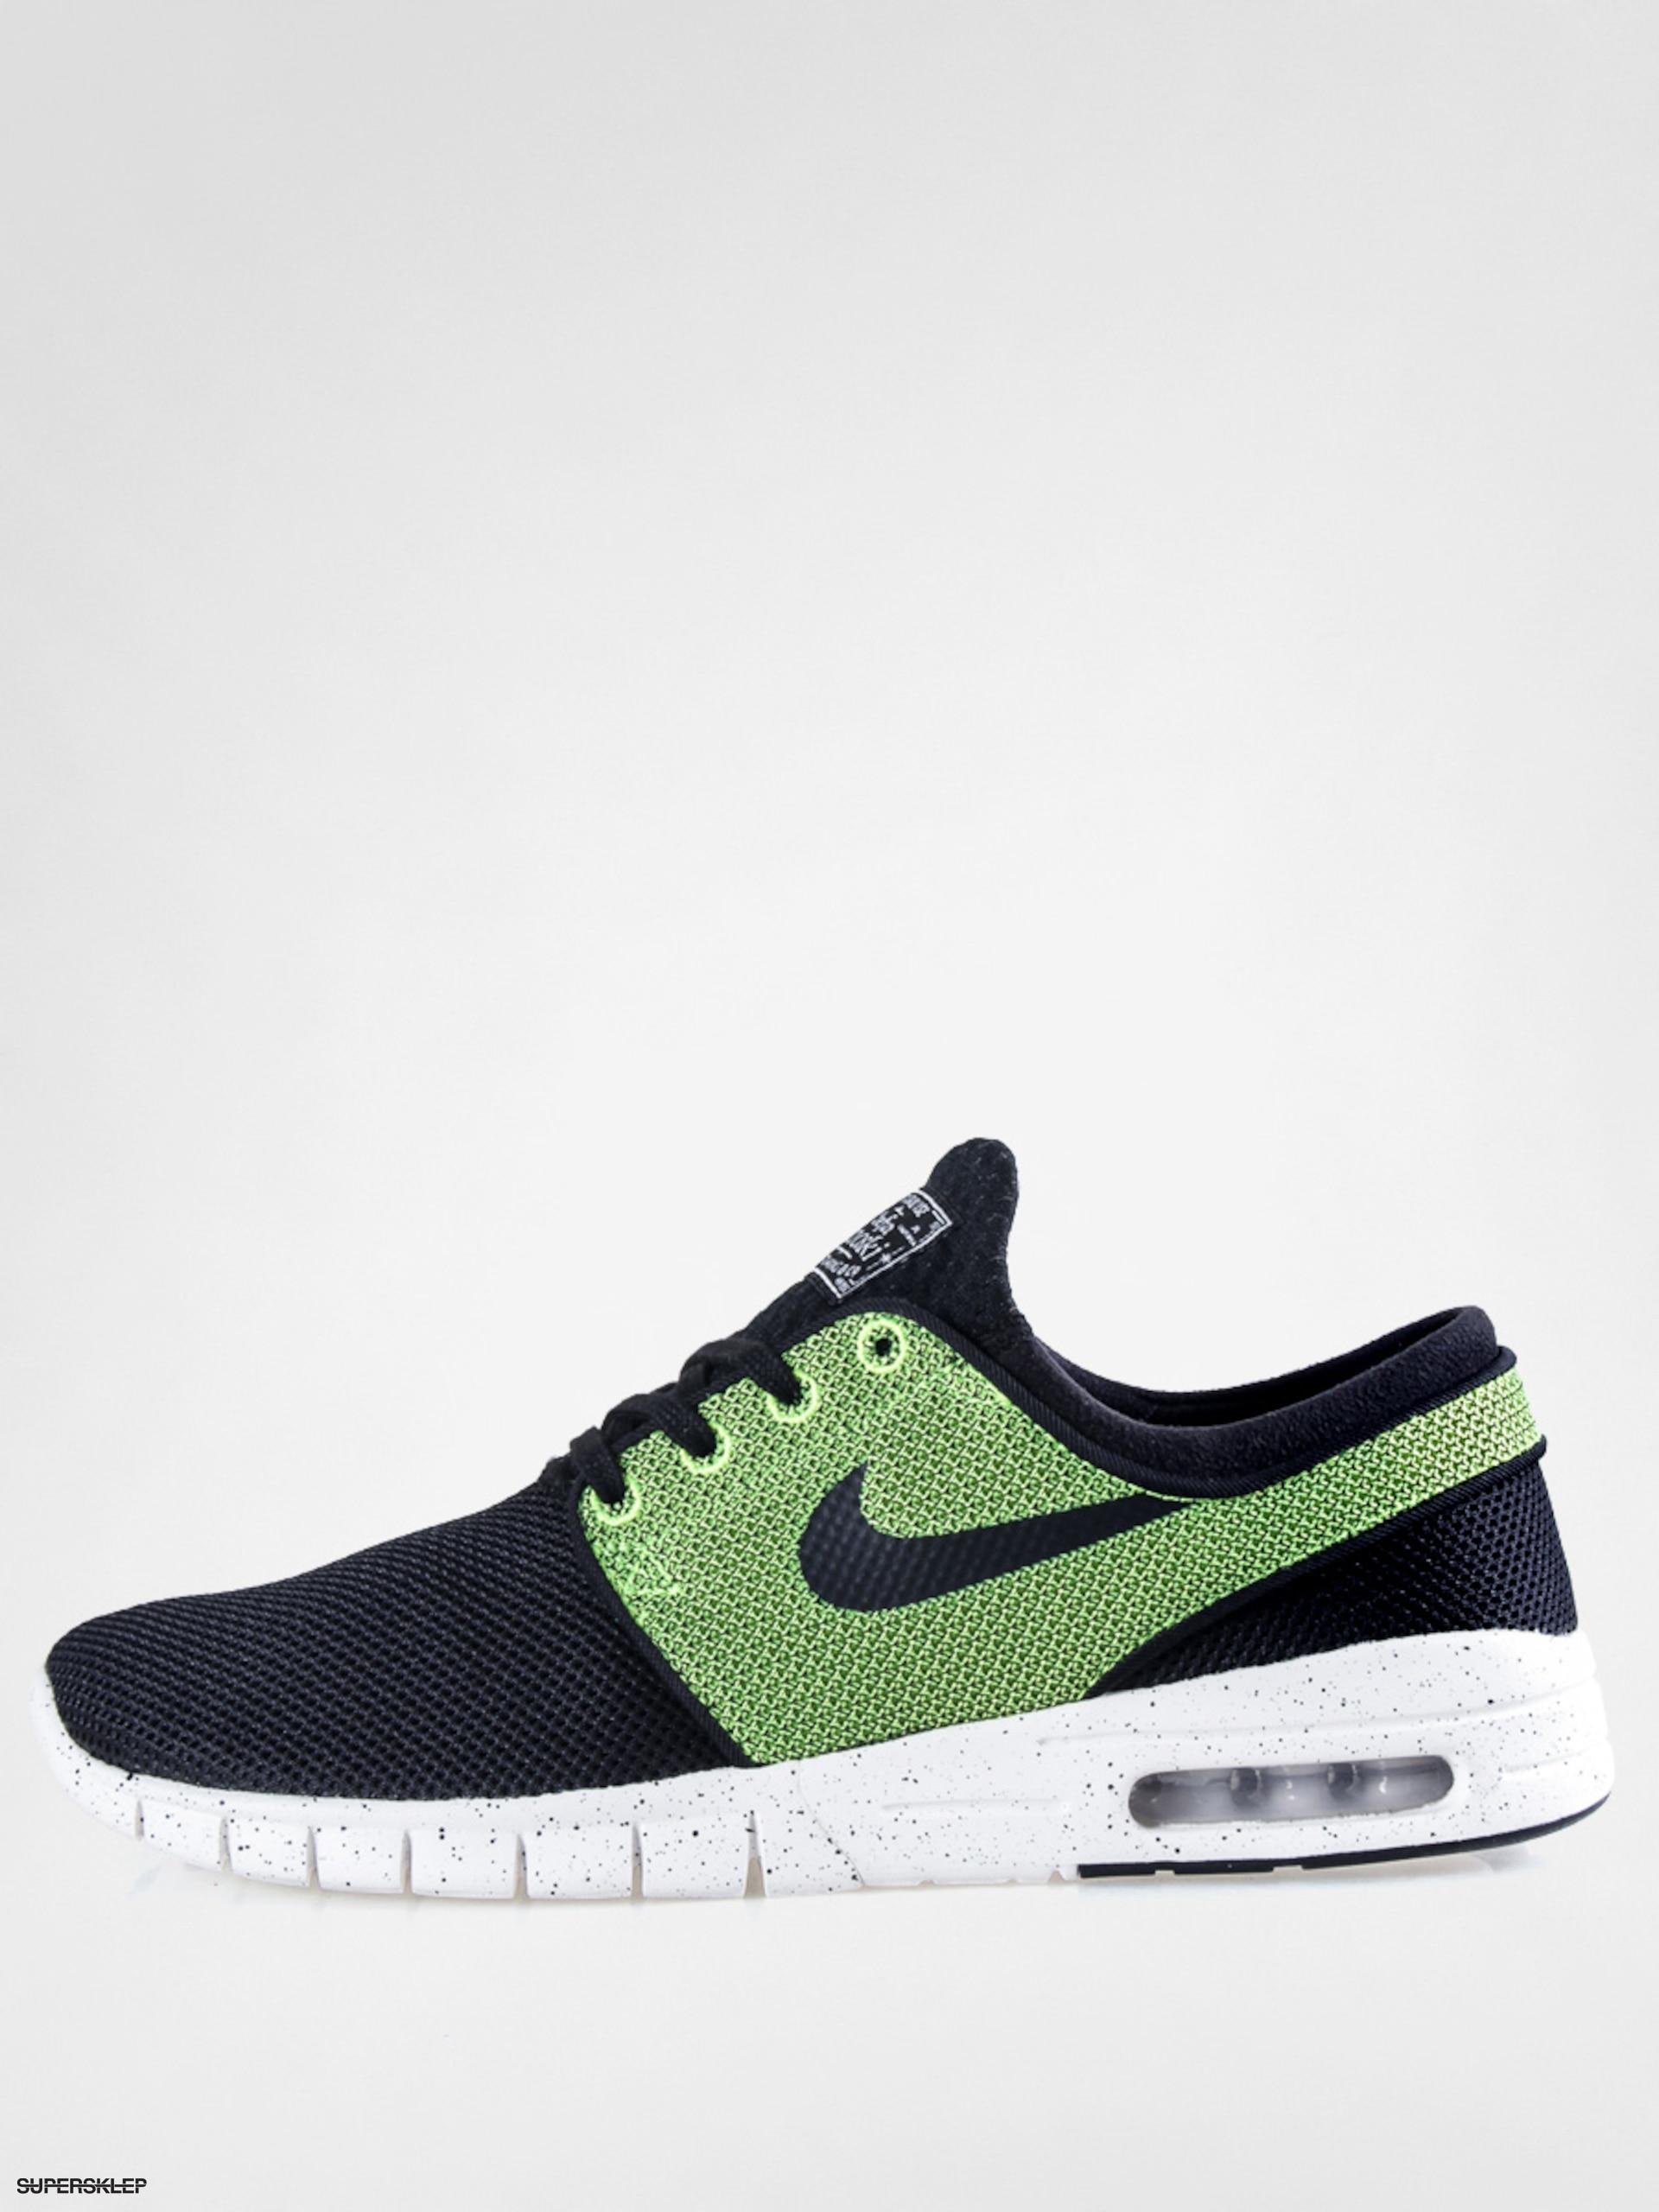 Buty Nike Janoski SB Stefan Janoski Nike Max (Noir/Noir volt ivory) 4281e3